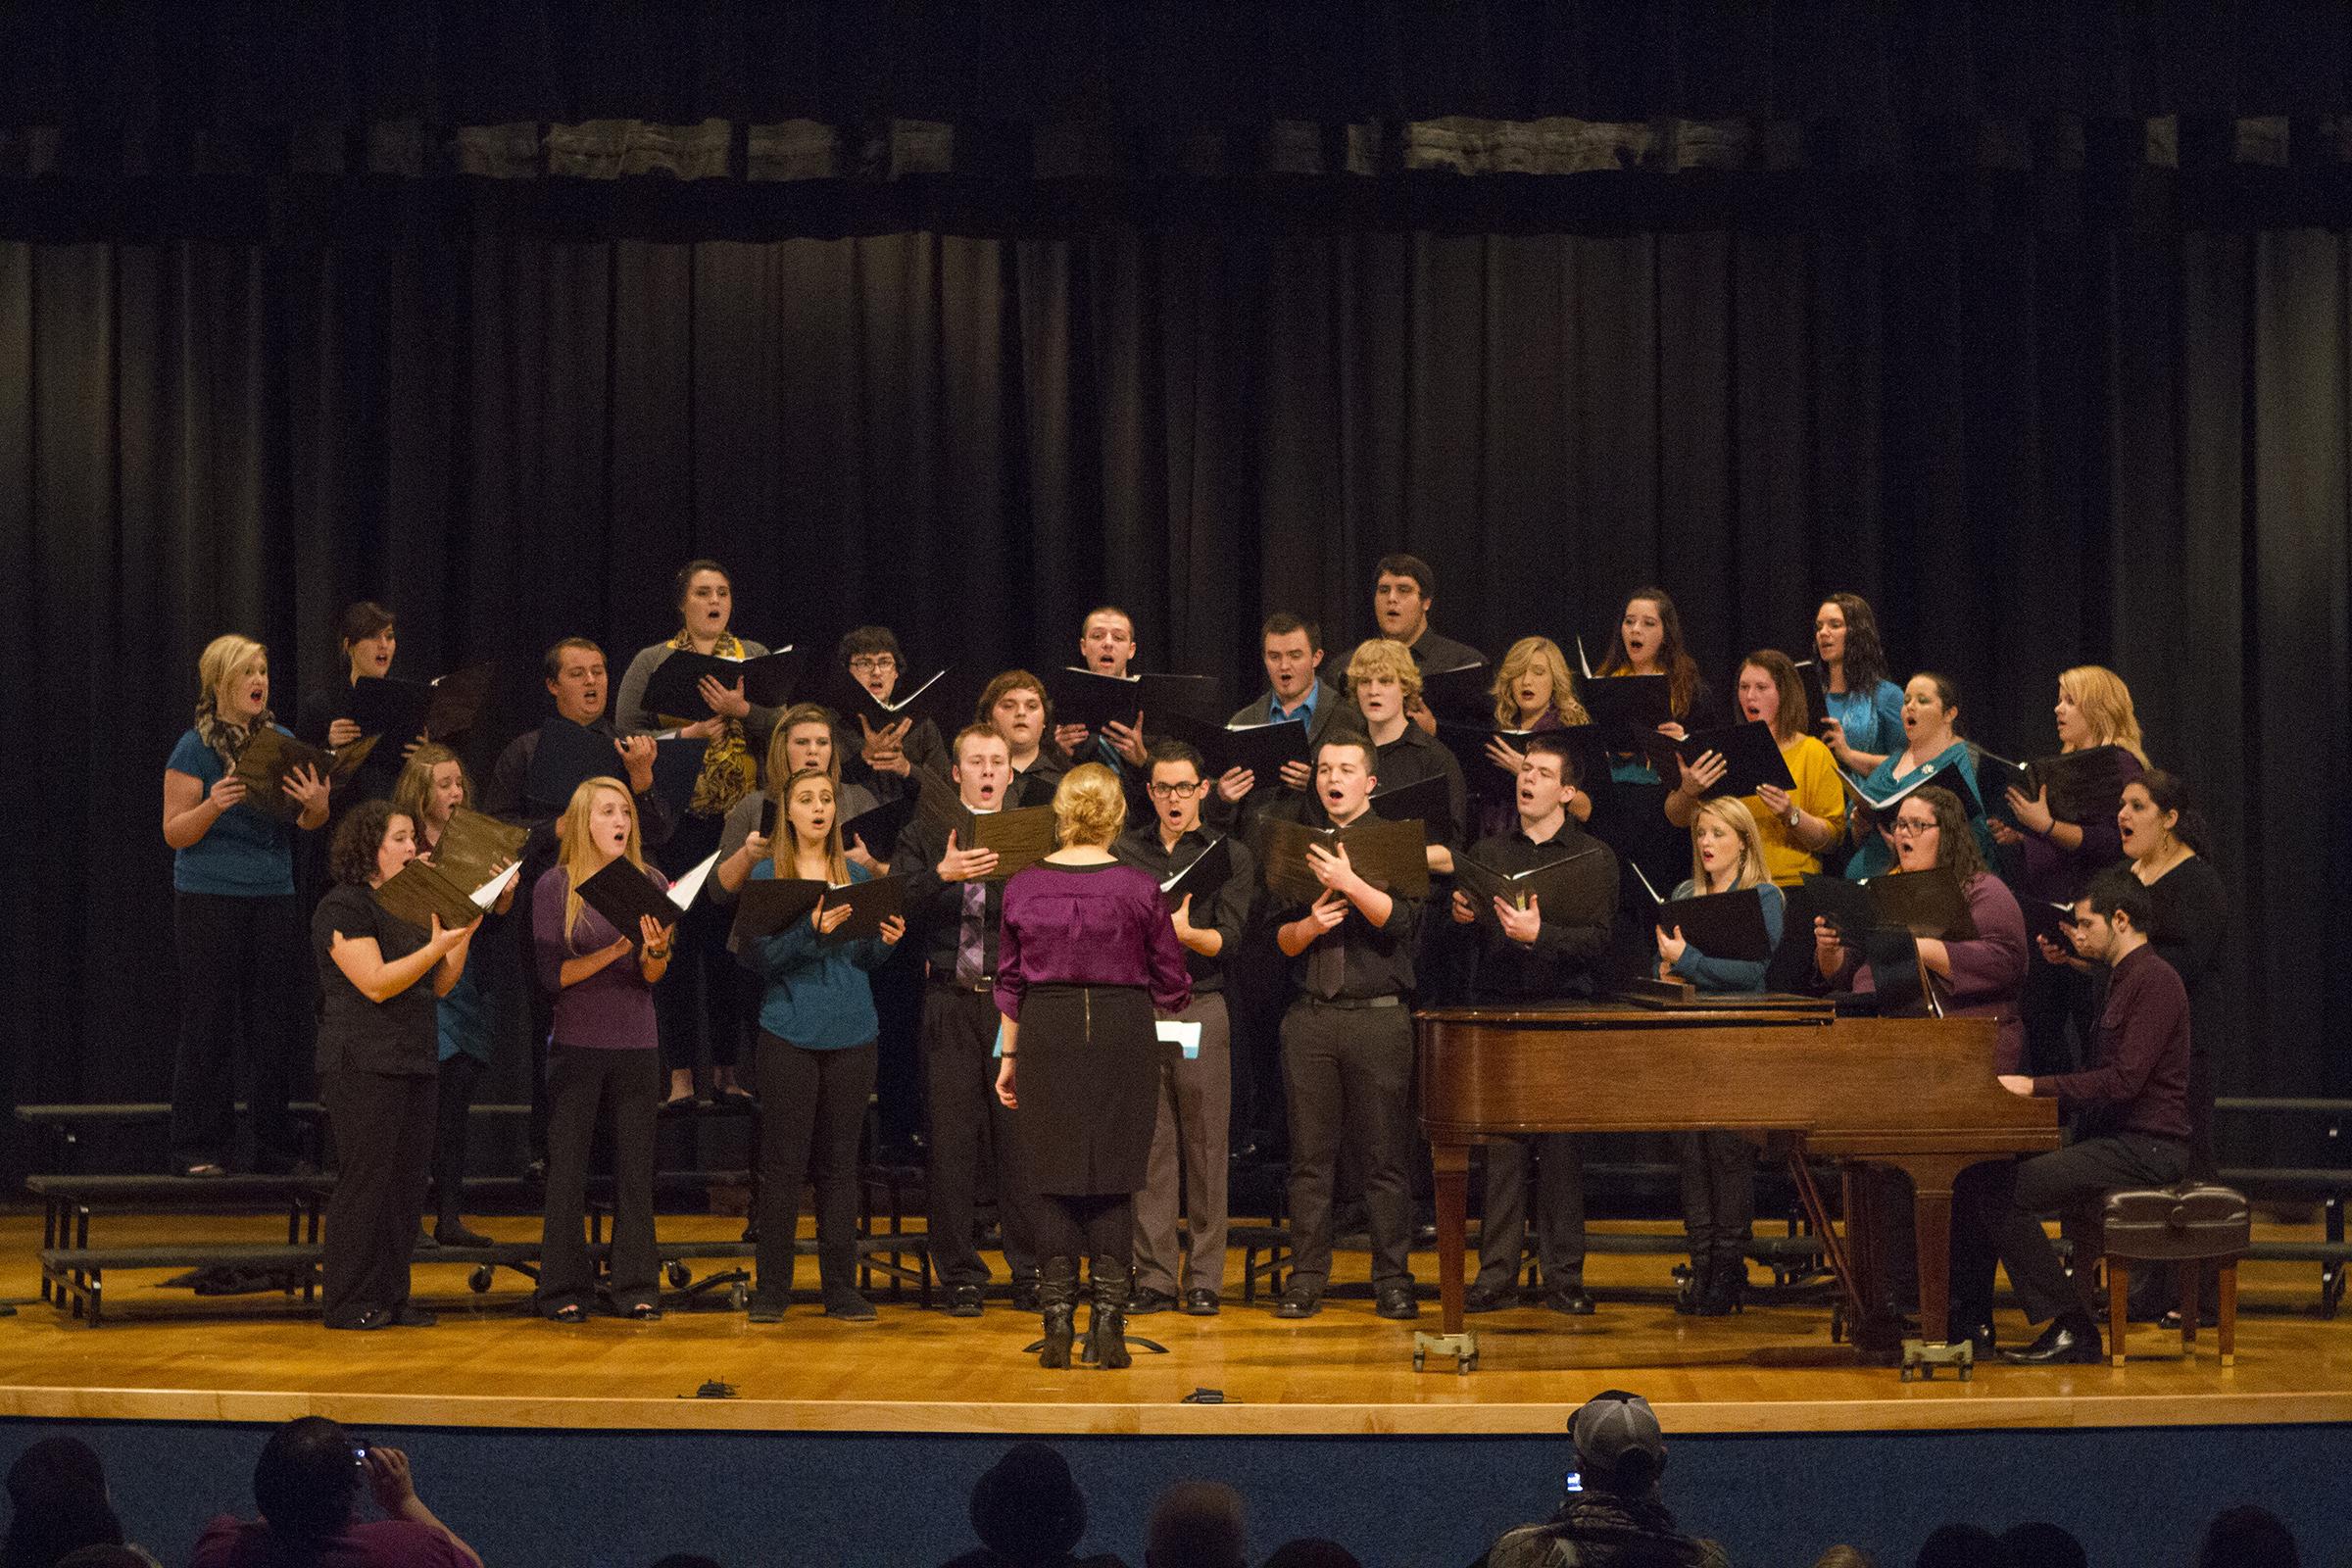 OTC Choir Concert